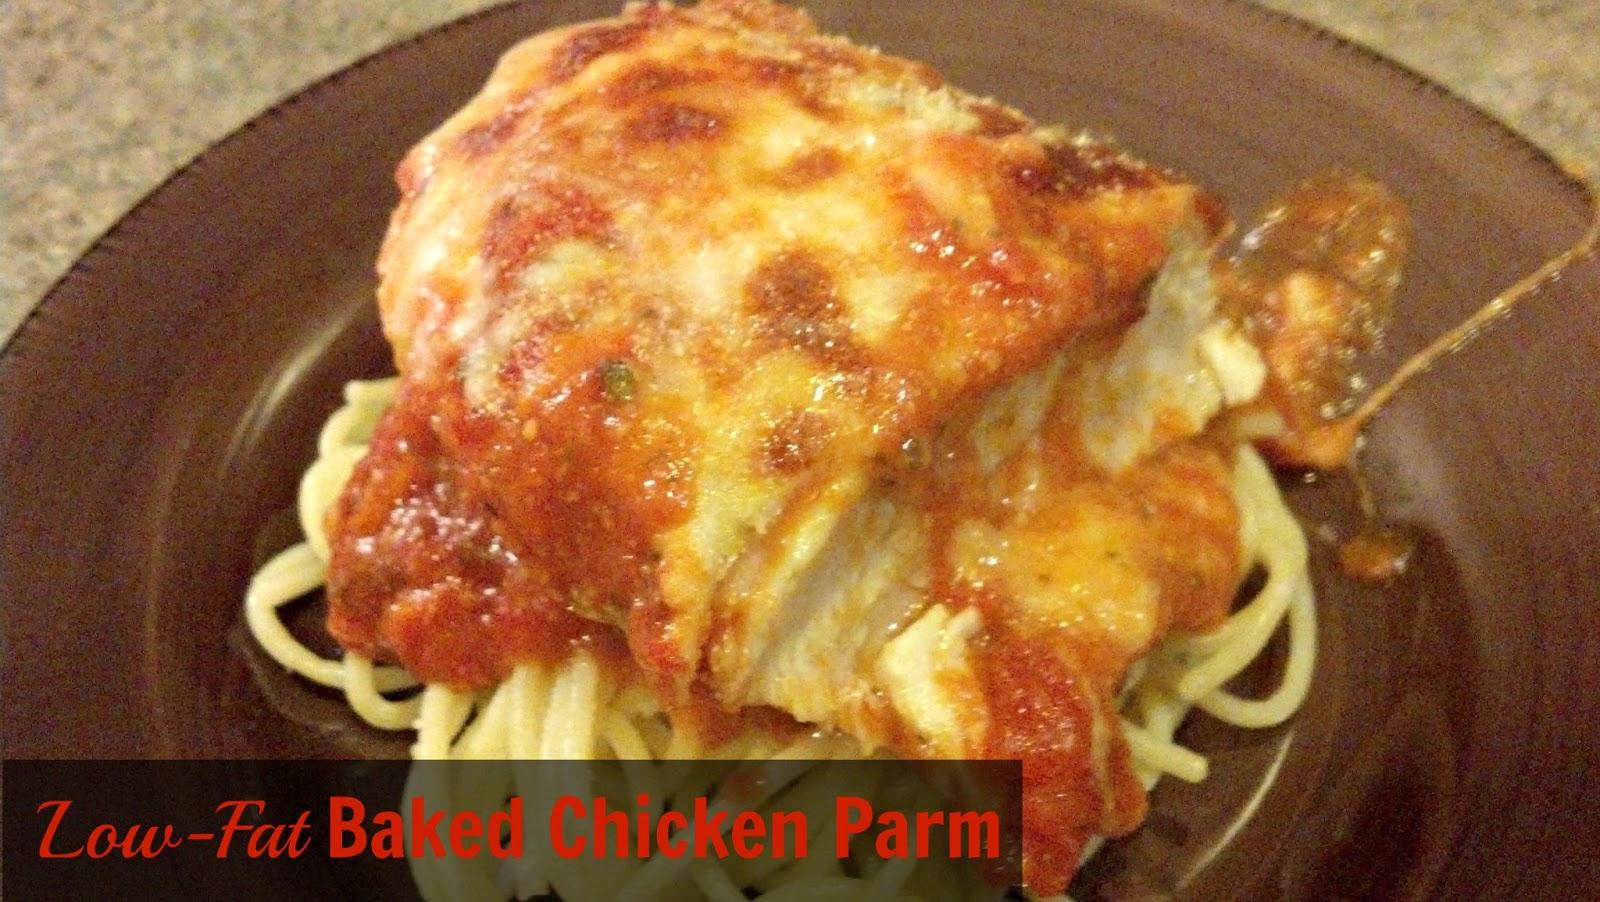 low fat baked chicken parm serves 4 ingredients 4 chicken